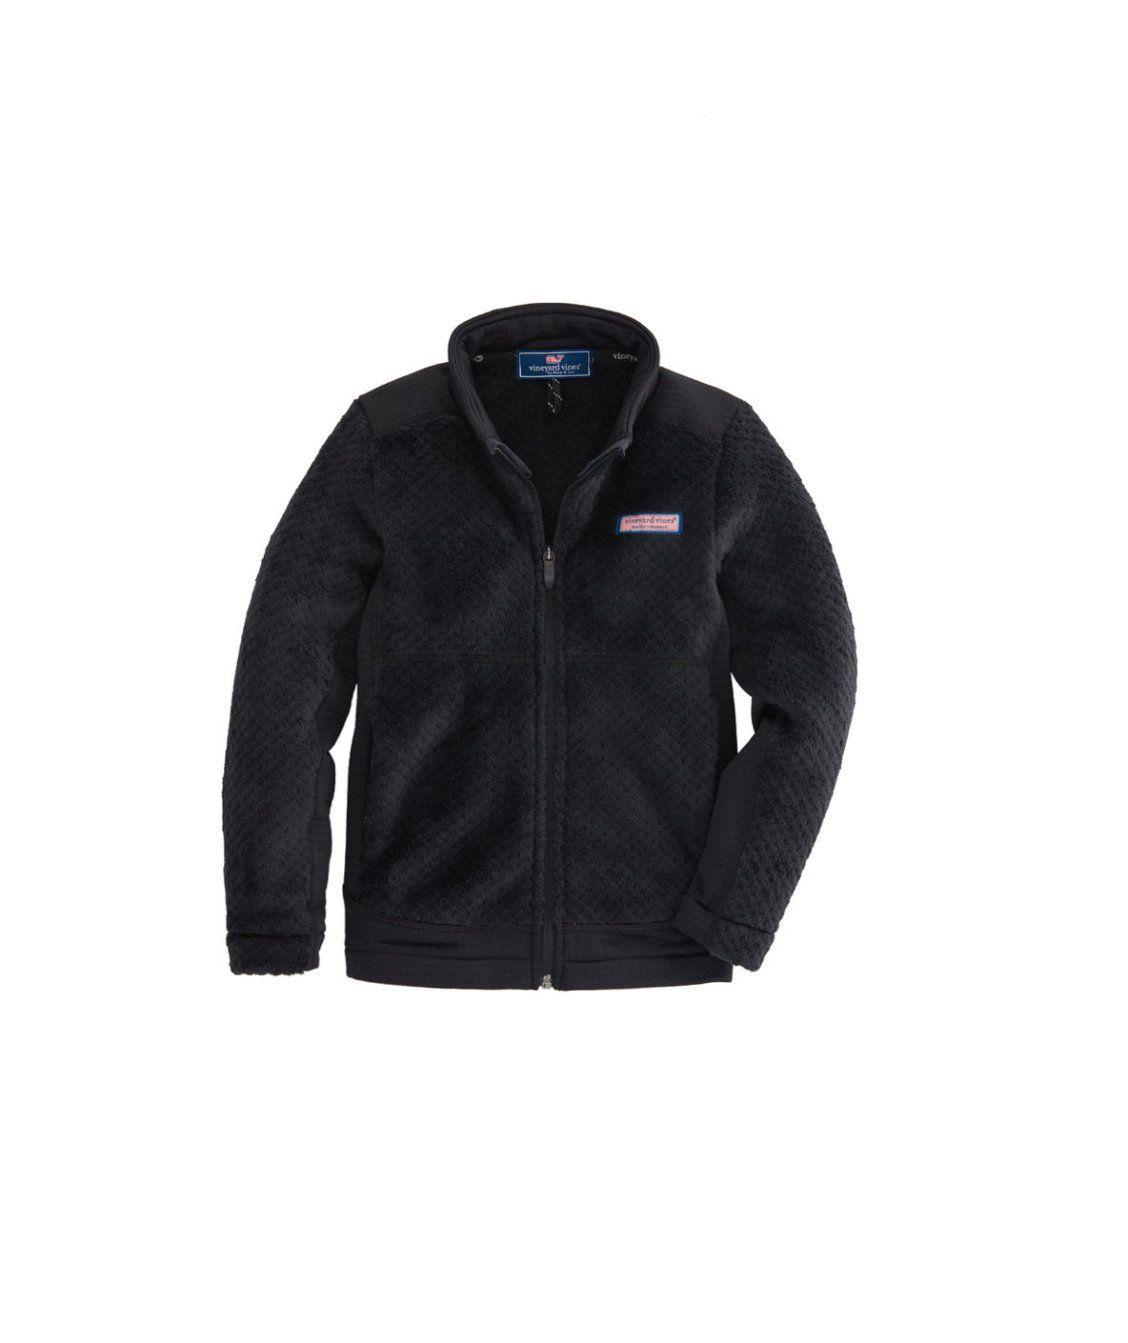 67f1d4505 Boys Performance High Pile Fleece Jacket